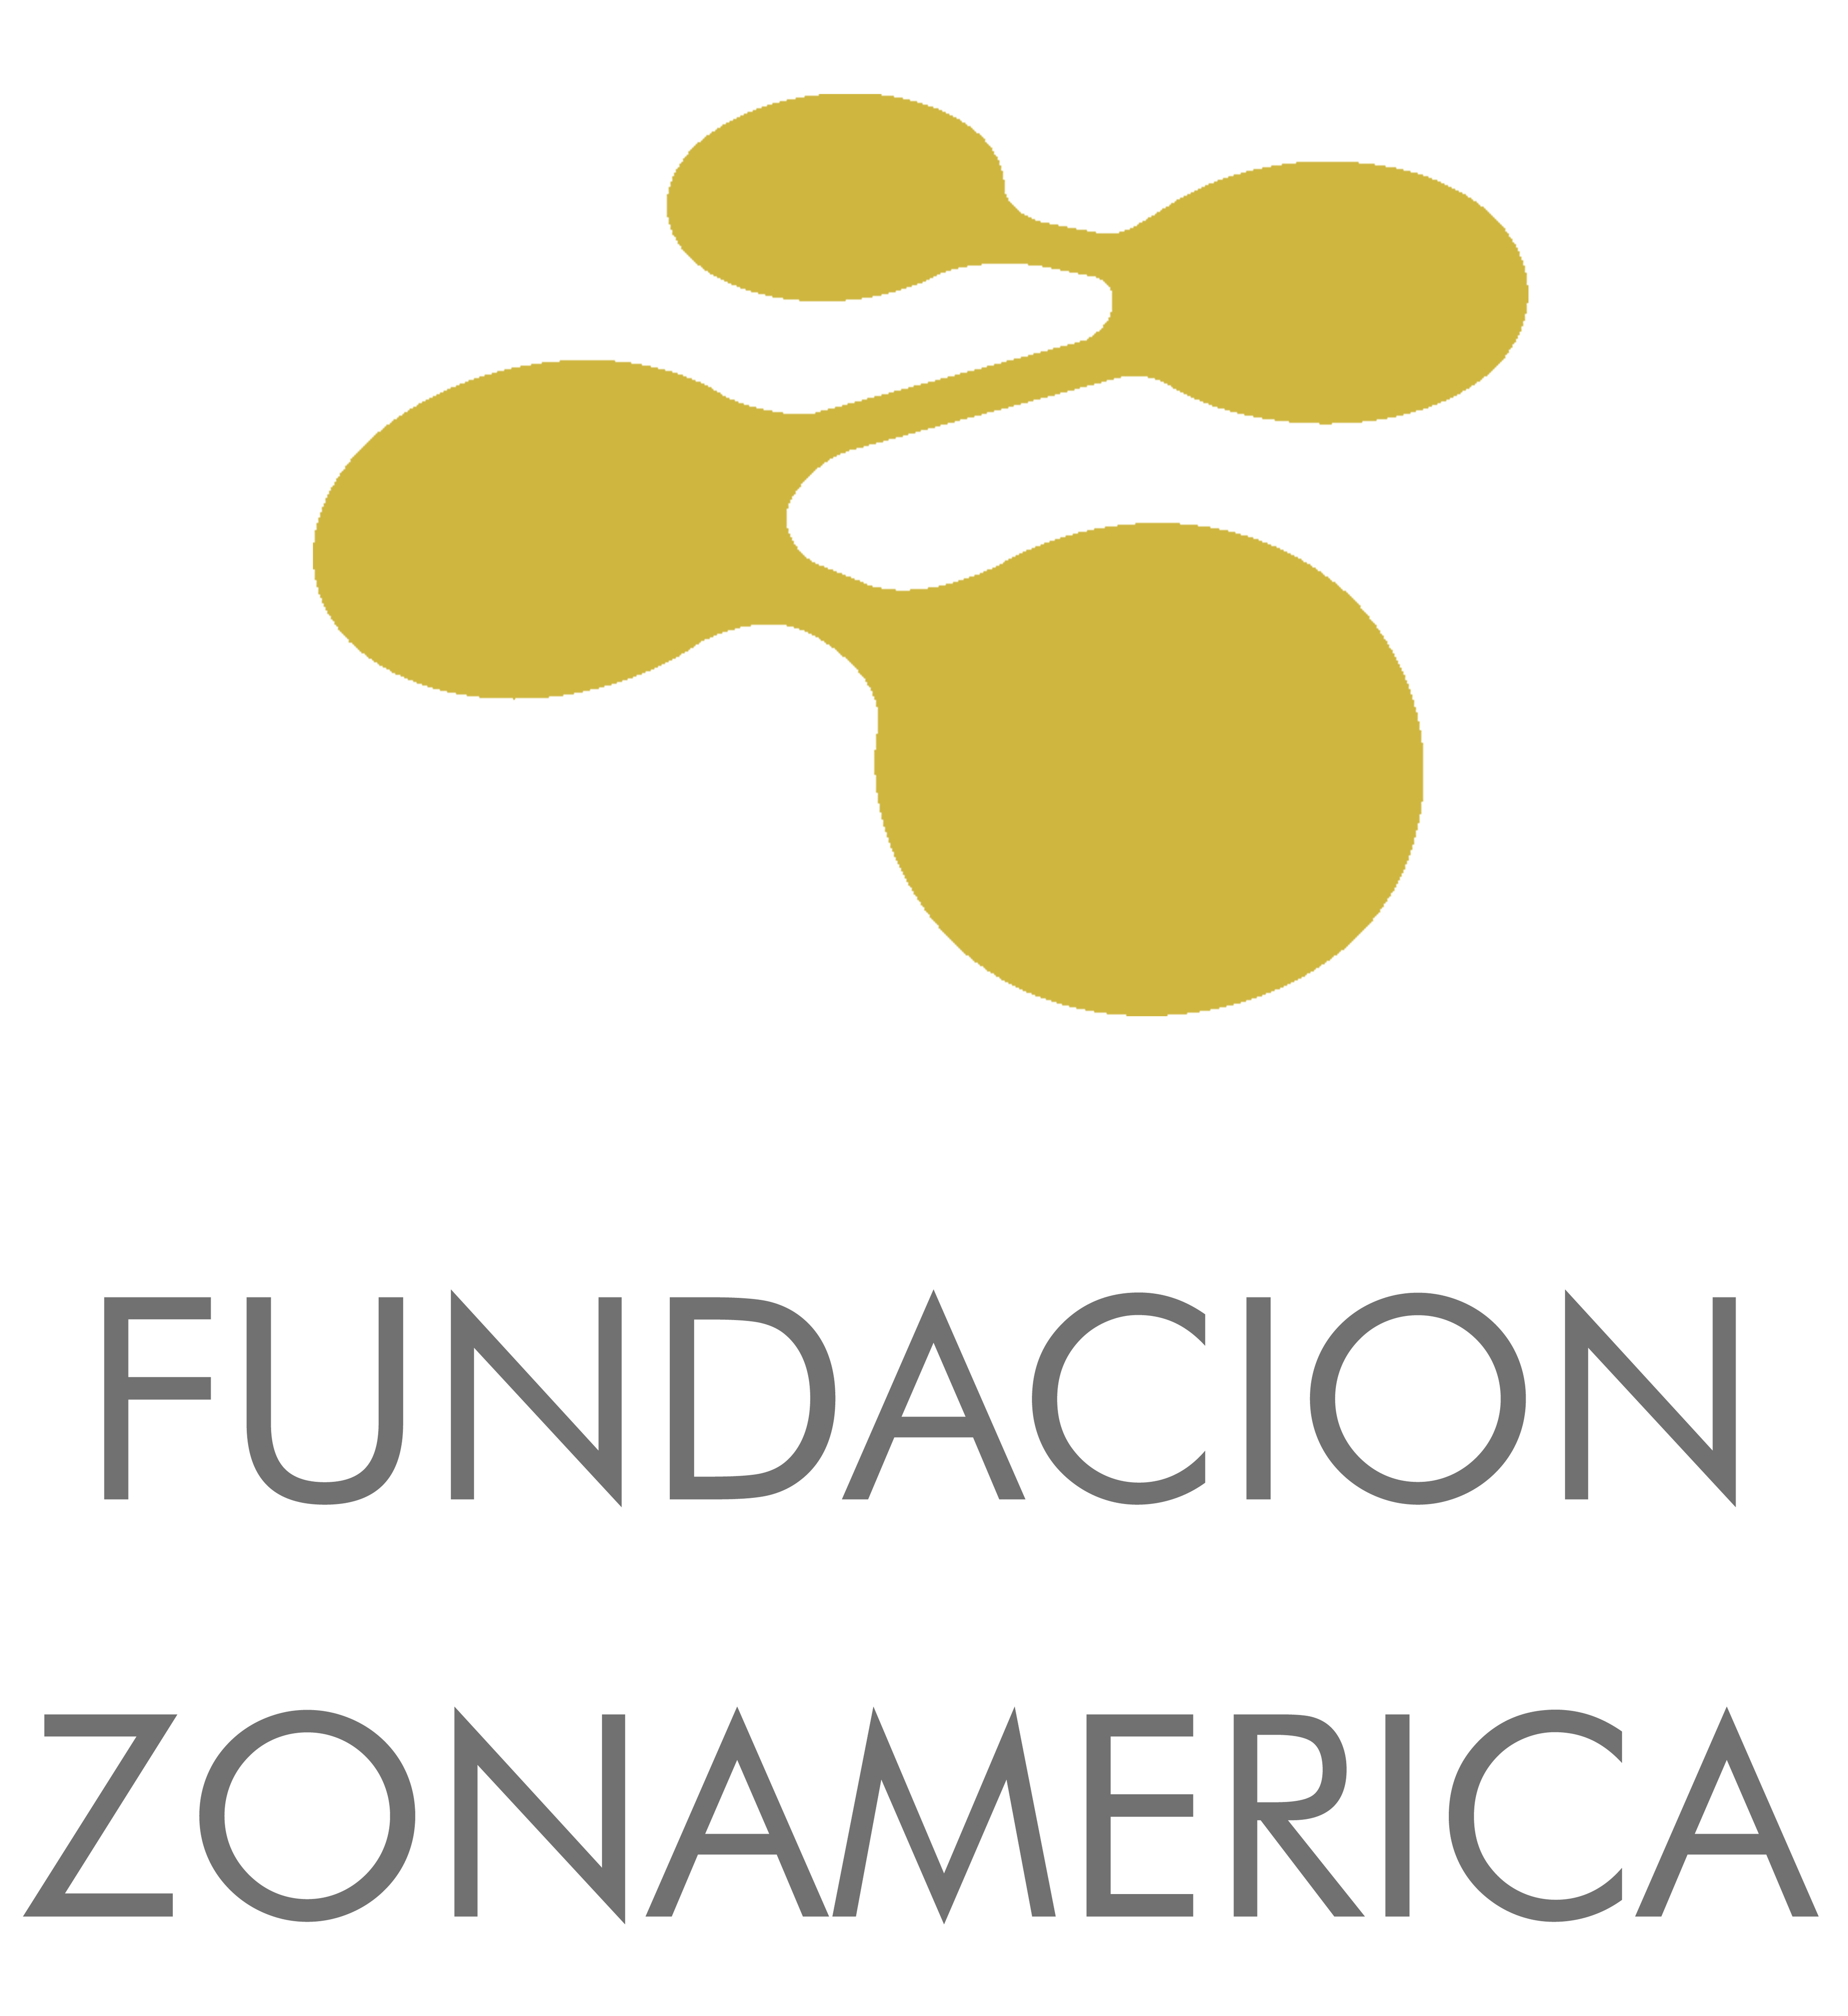 fundacion zonamerica logo